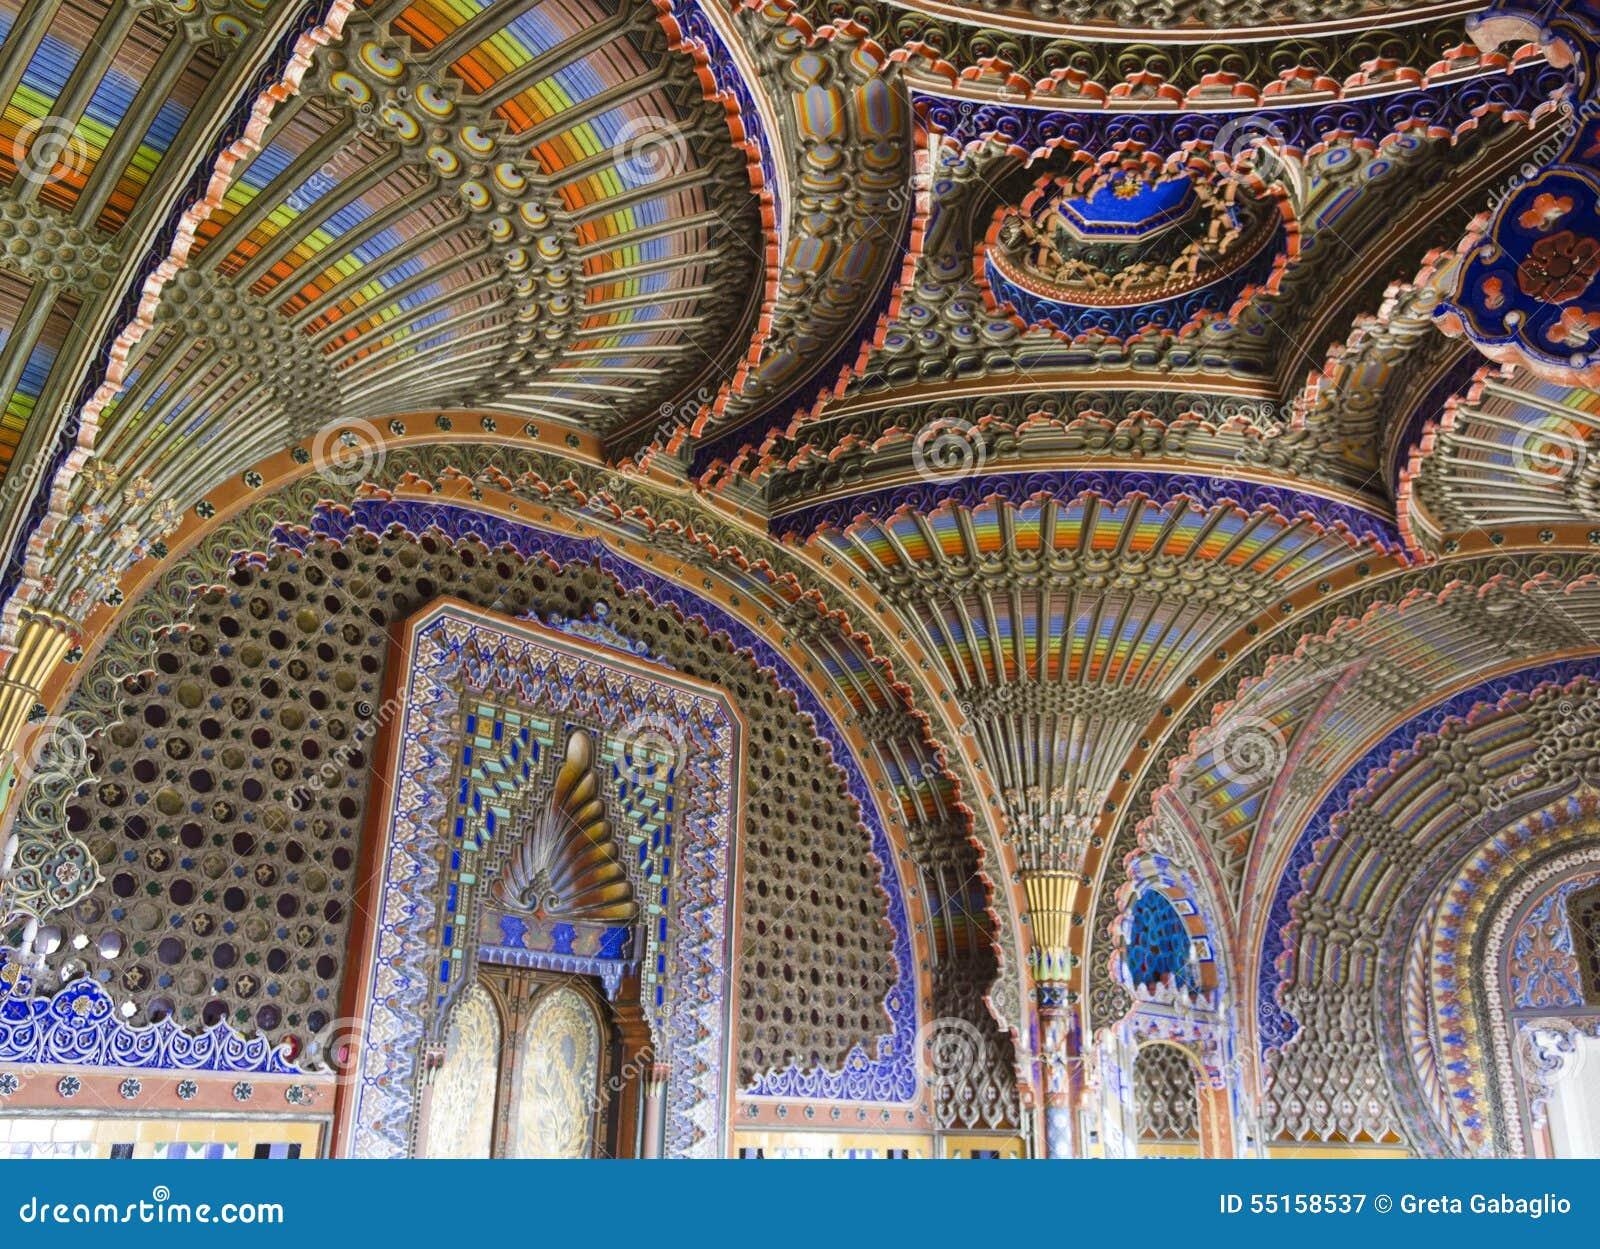 Reggello Italy  city photos gallery : REGGELLO, ITALY MAY 2 2015: The magnificent Peacock Room inside the ...